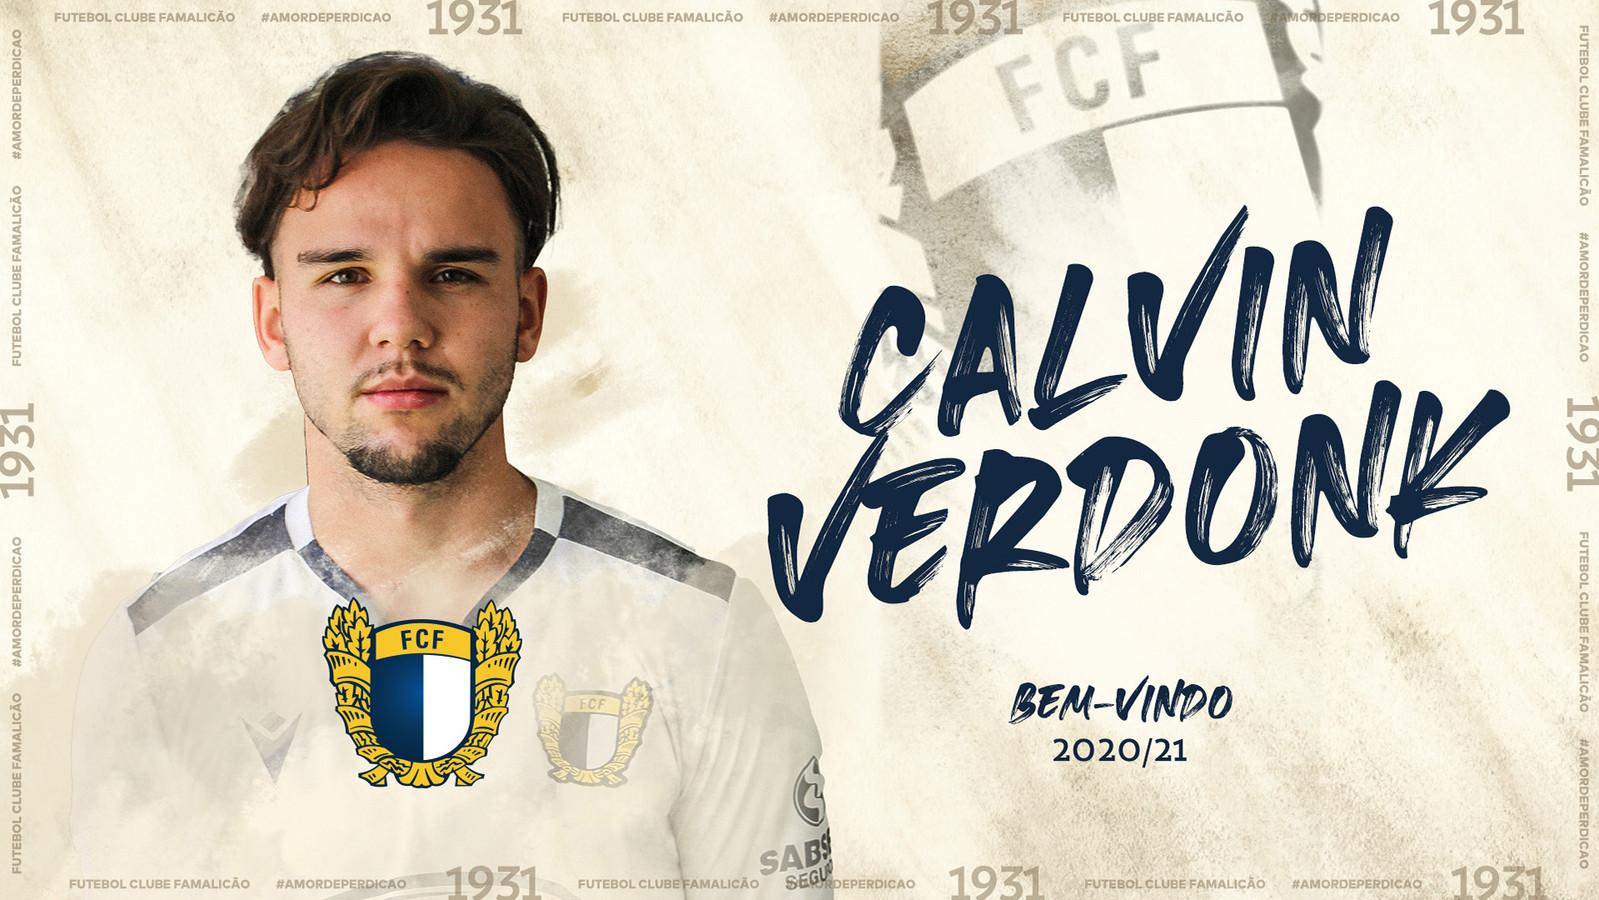 2020 Calvin Verdonk speelt komend seizoen in Protugal bij Fc Famalicão